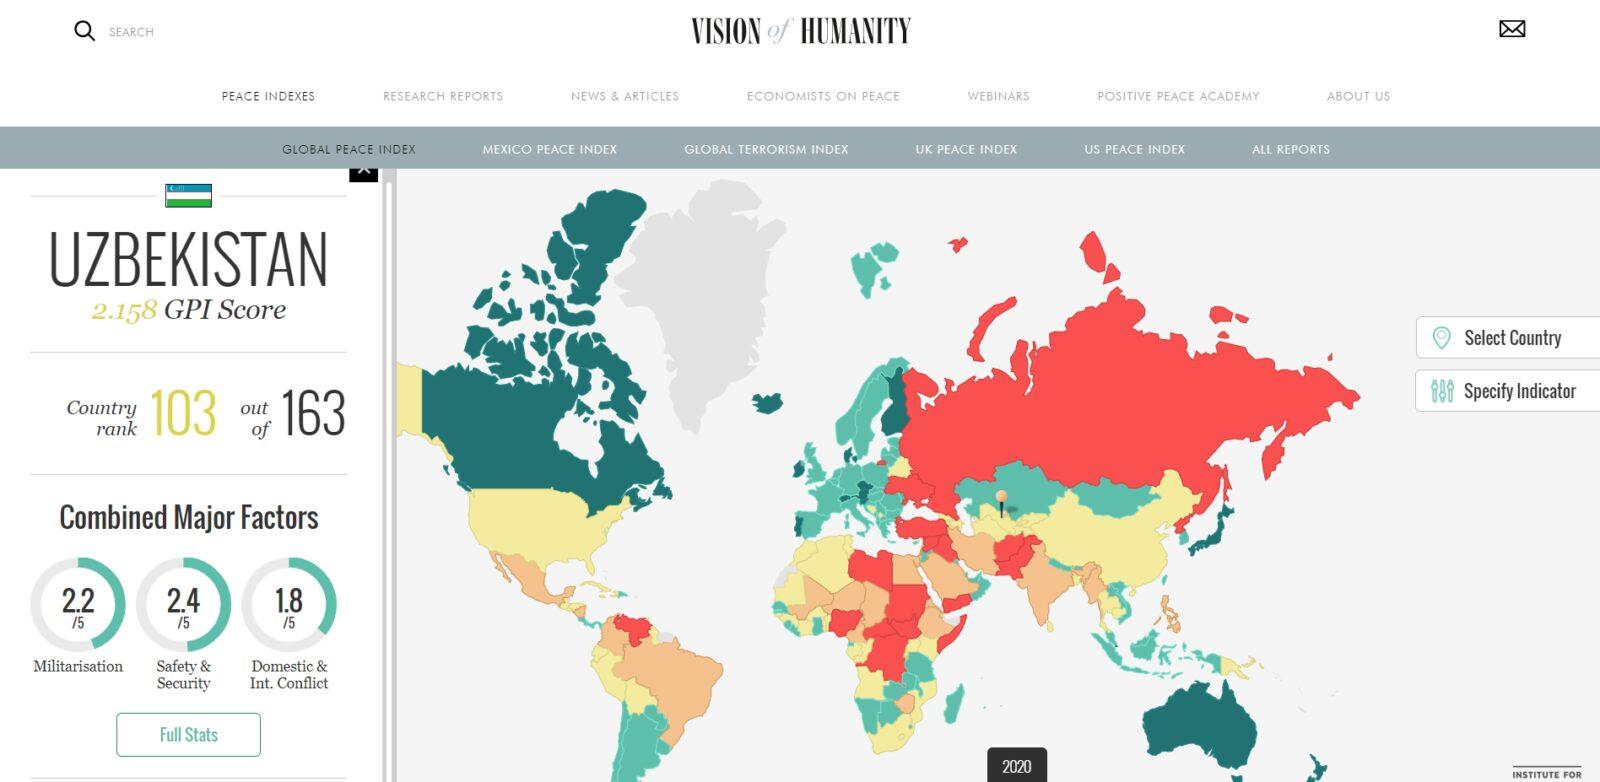 Ўзбекистон «Тинчликсеварлик глобал индекси»да бир поғона пастга тушди